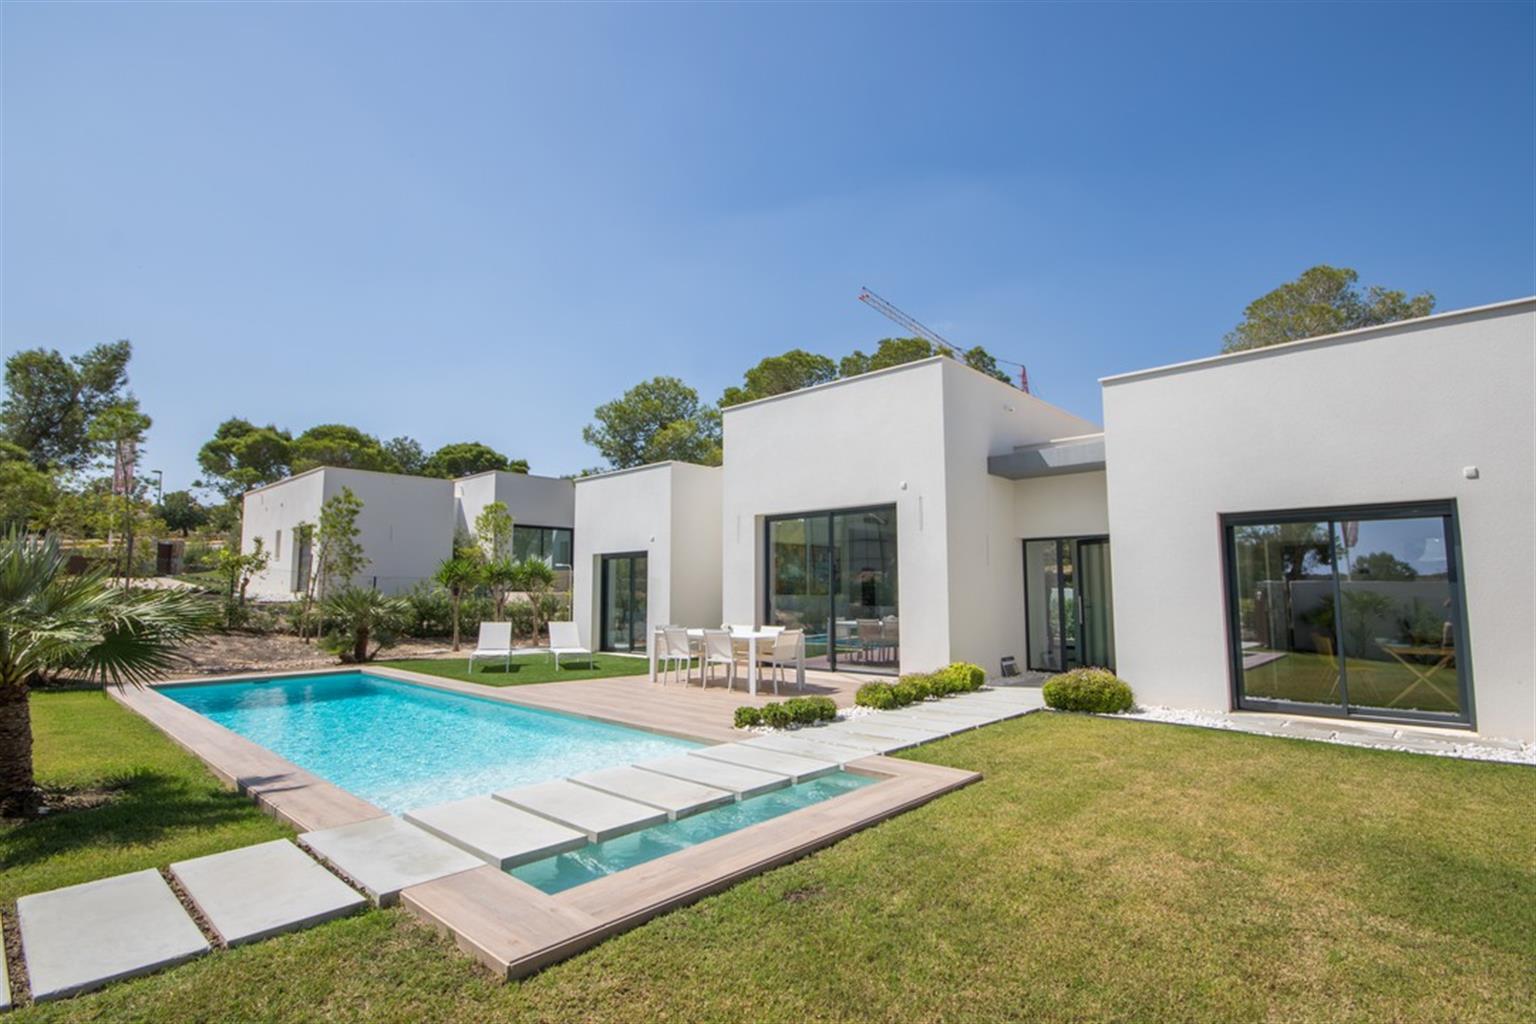 Maison - Villamartin - #4228155-27